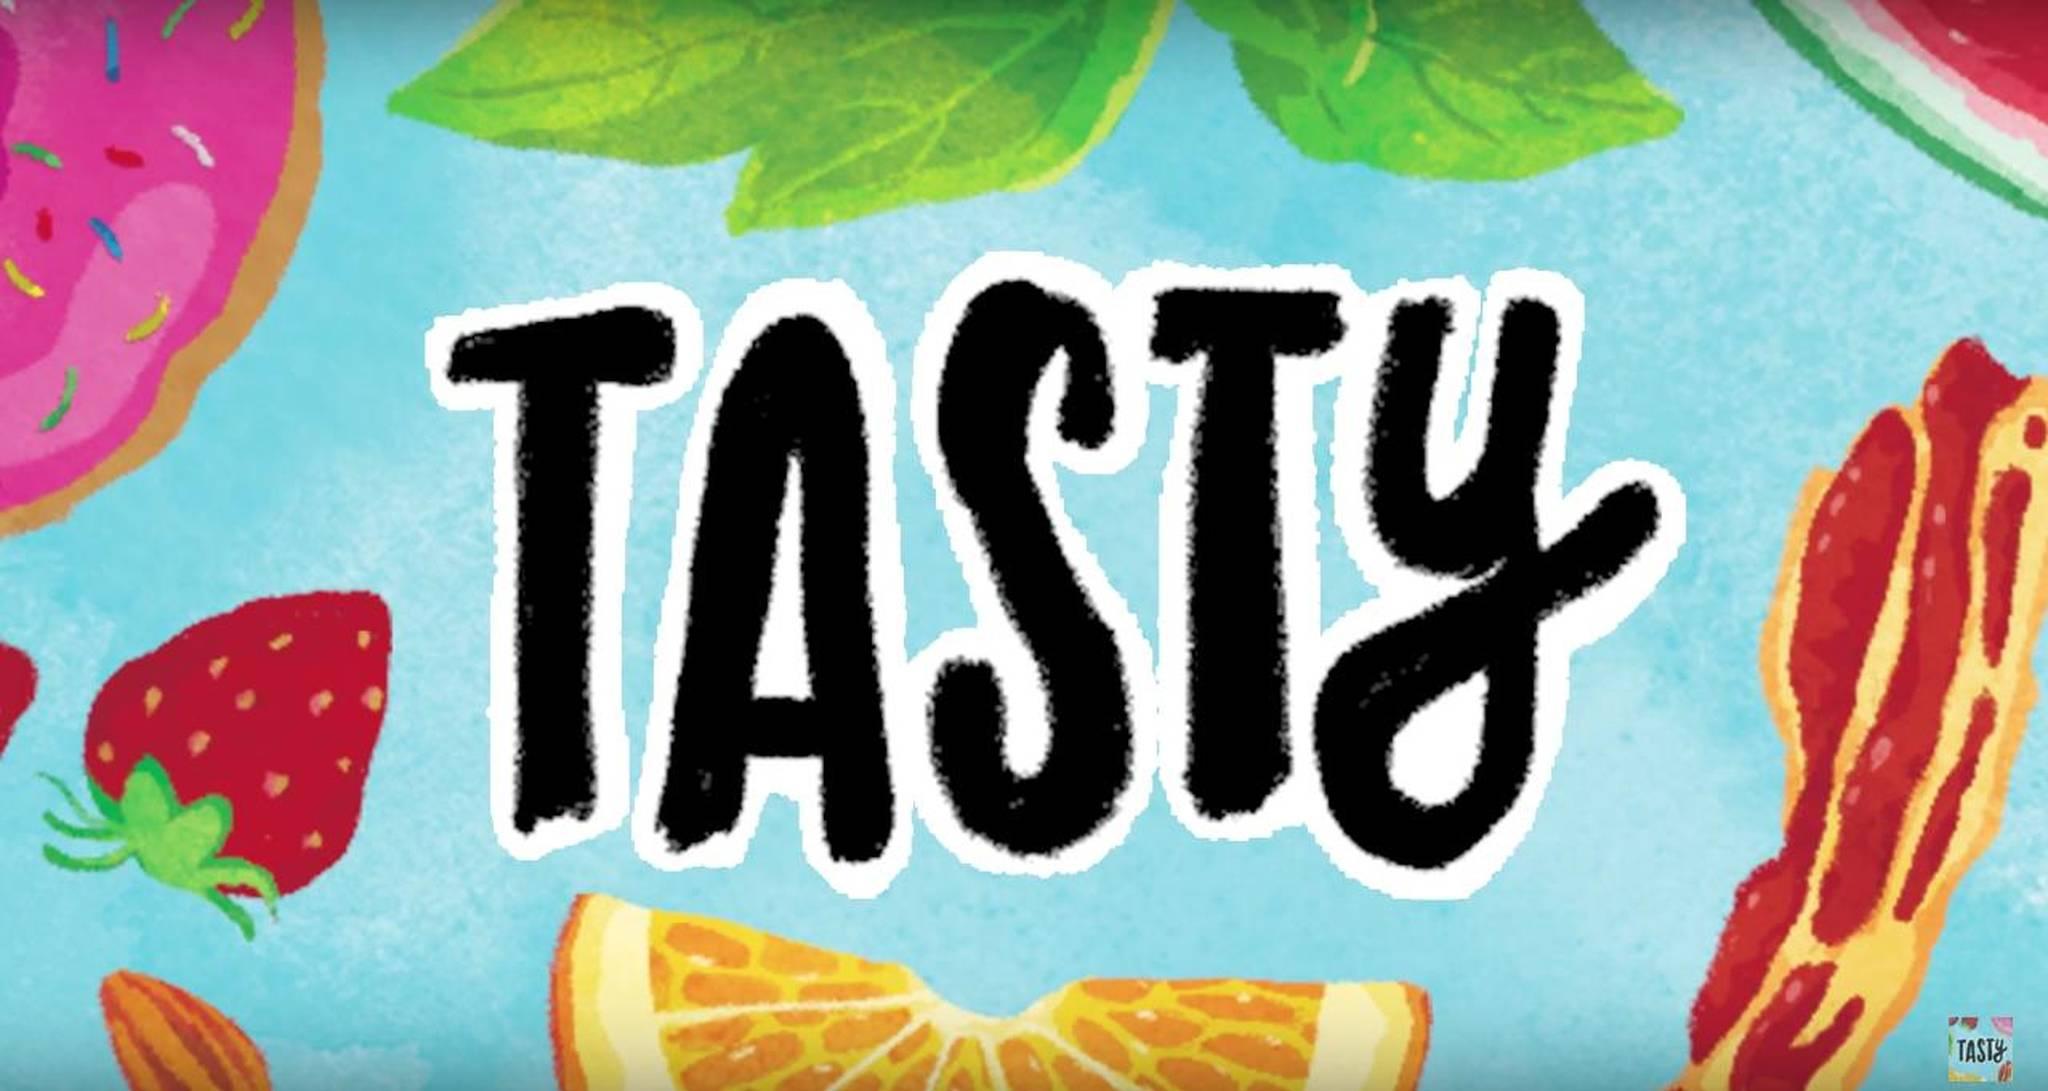 Tasty Logos.